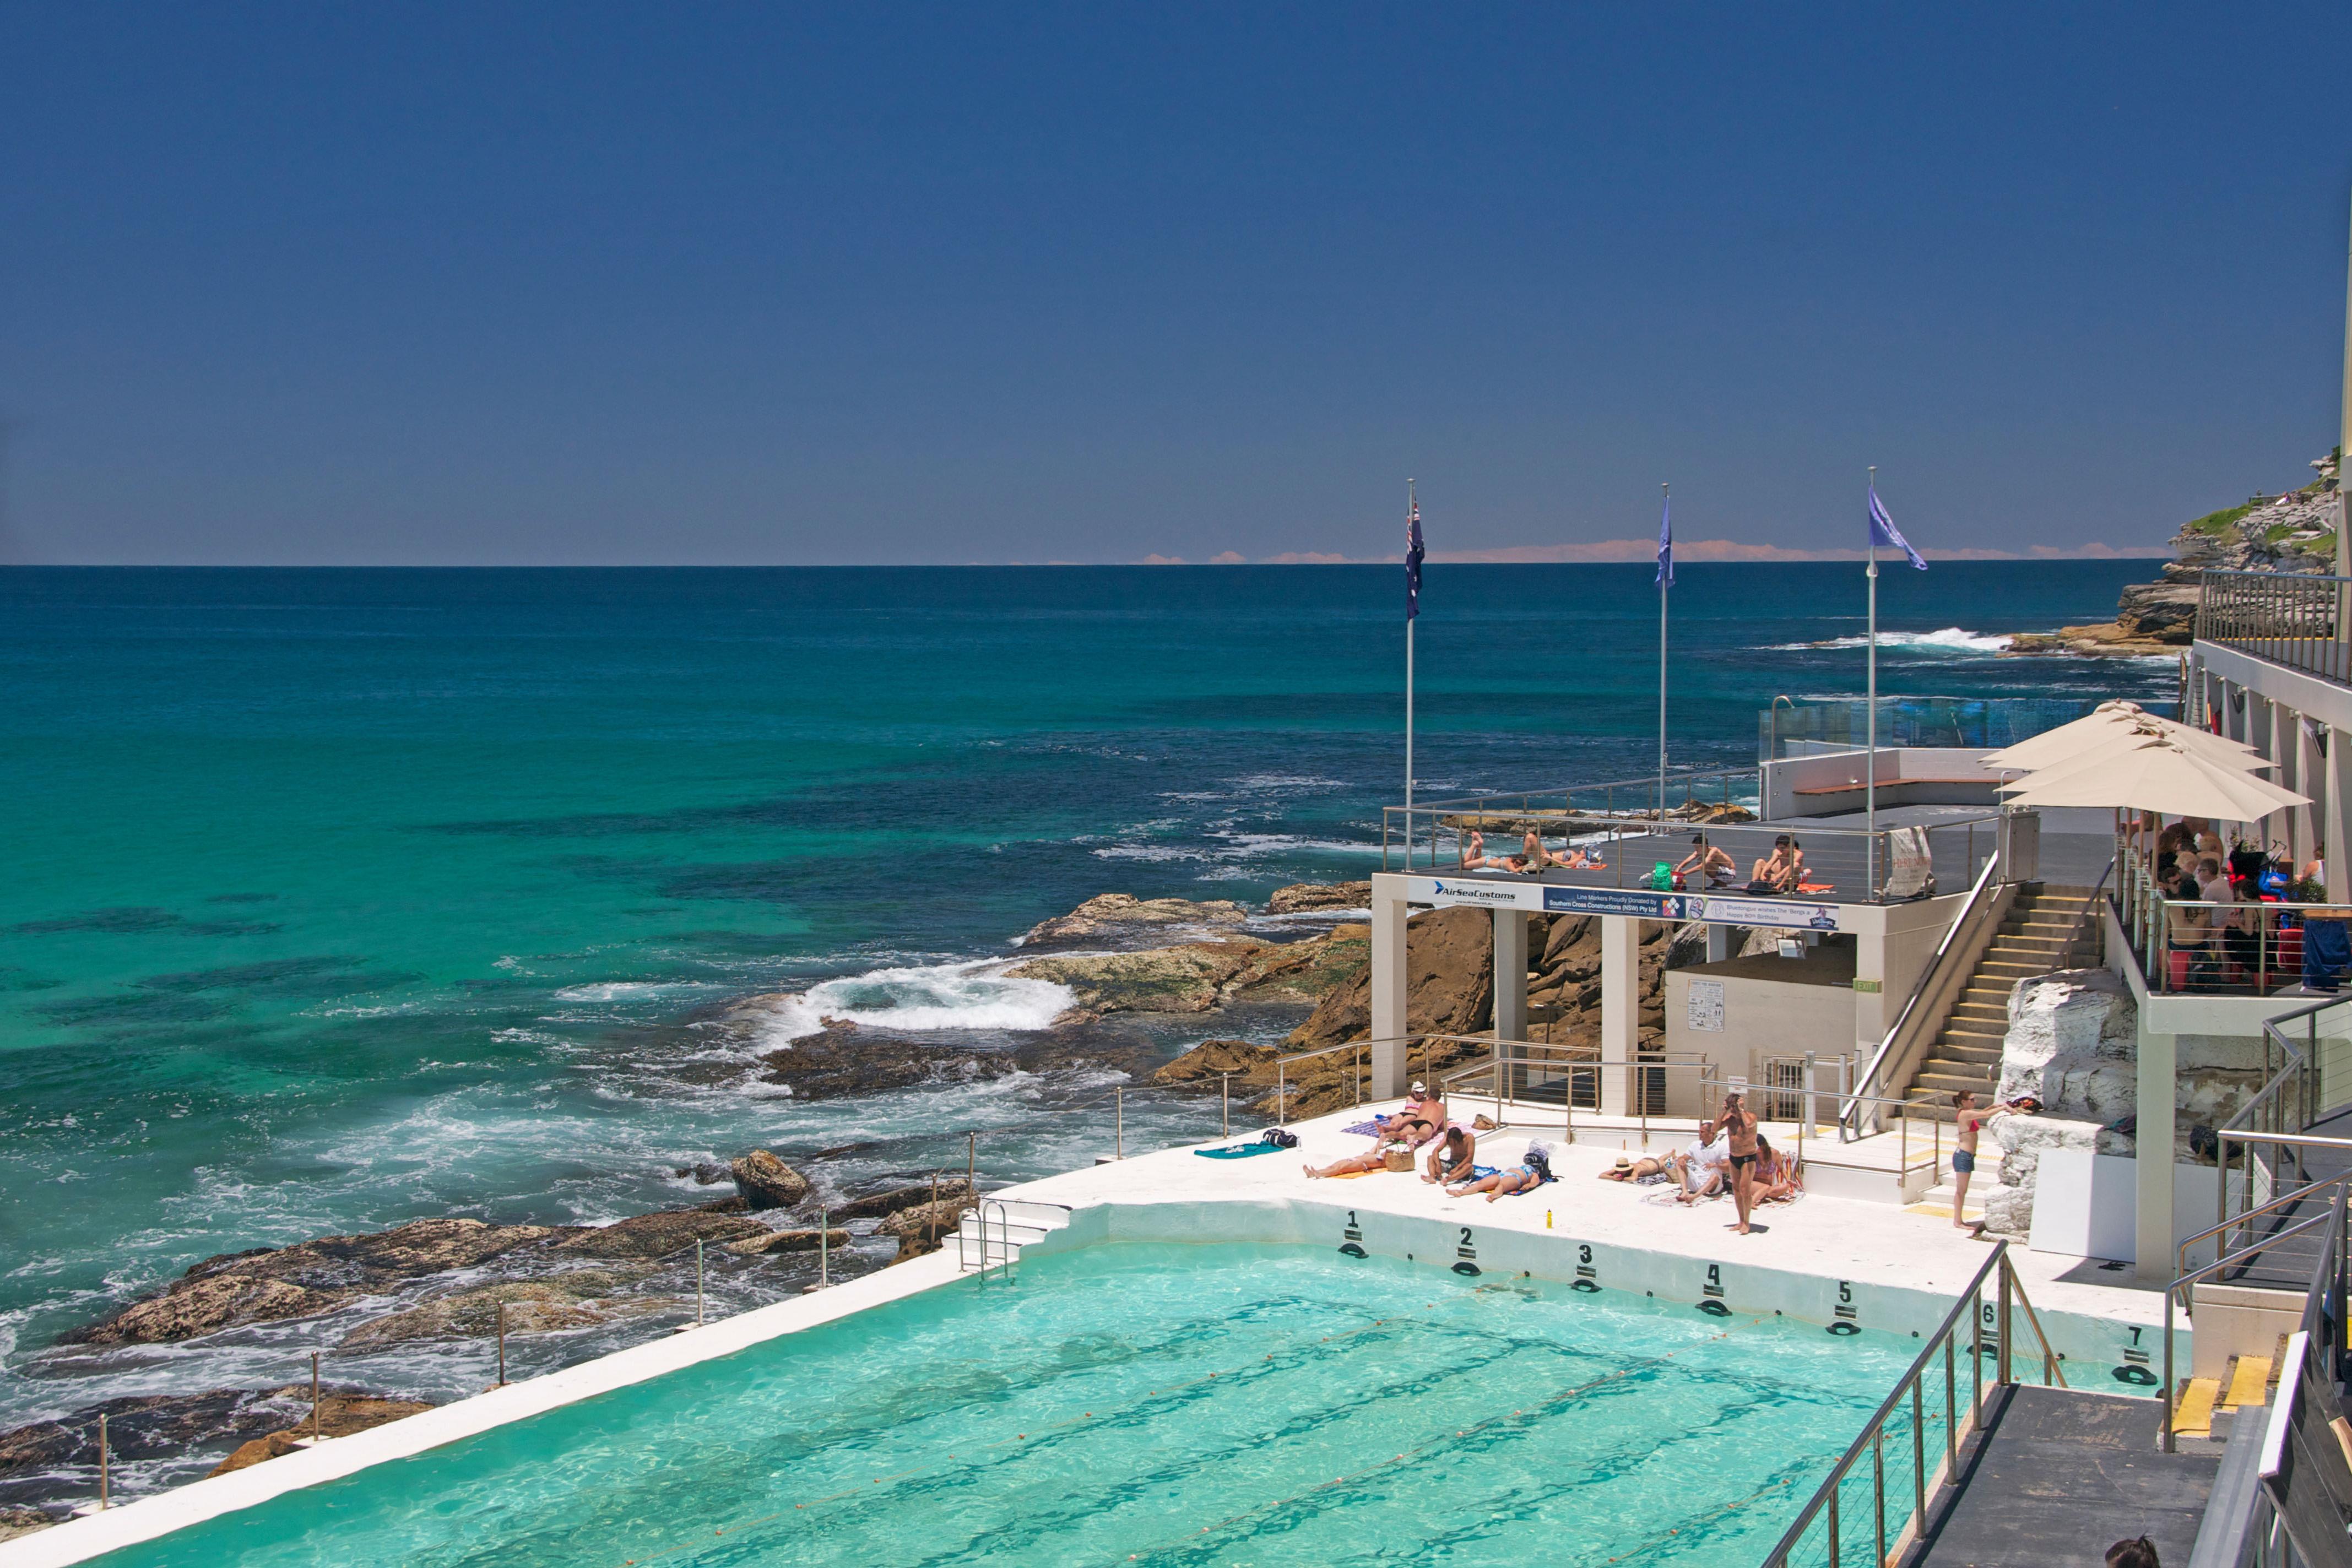 Icebergs Club and swimming pool on South Bondi Beach